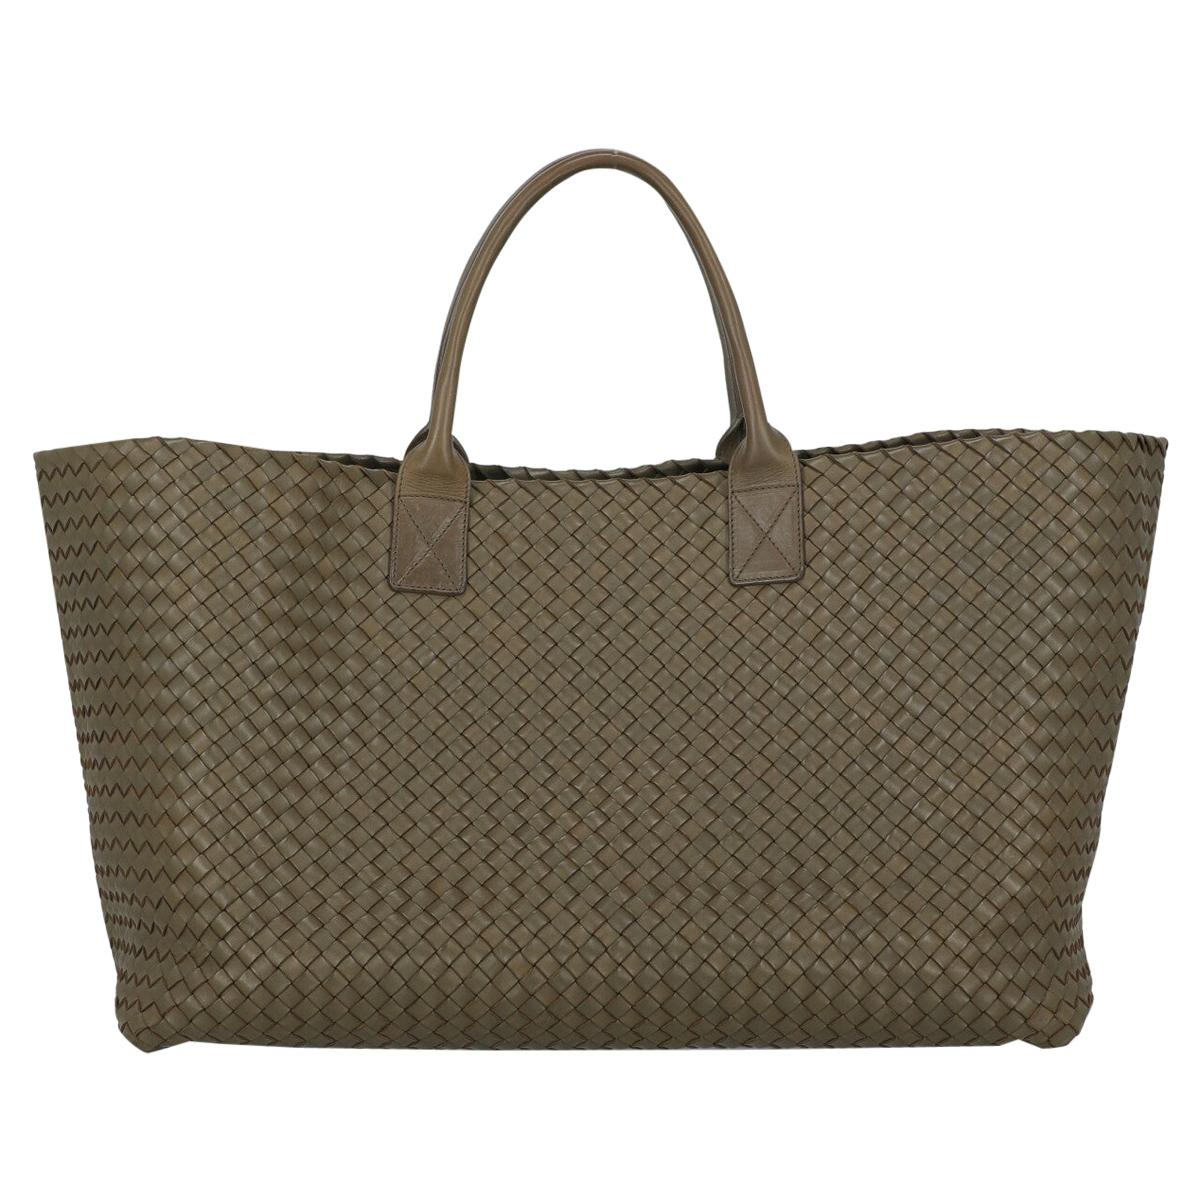 Dior Women's Handbag Green Leather